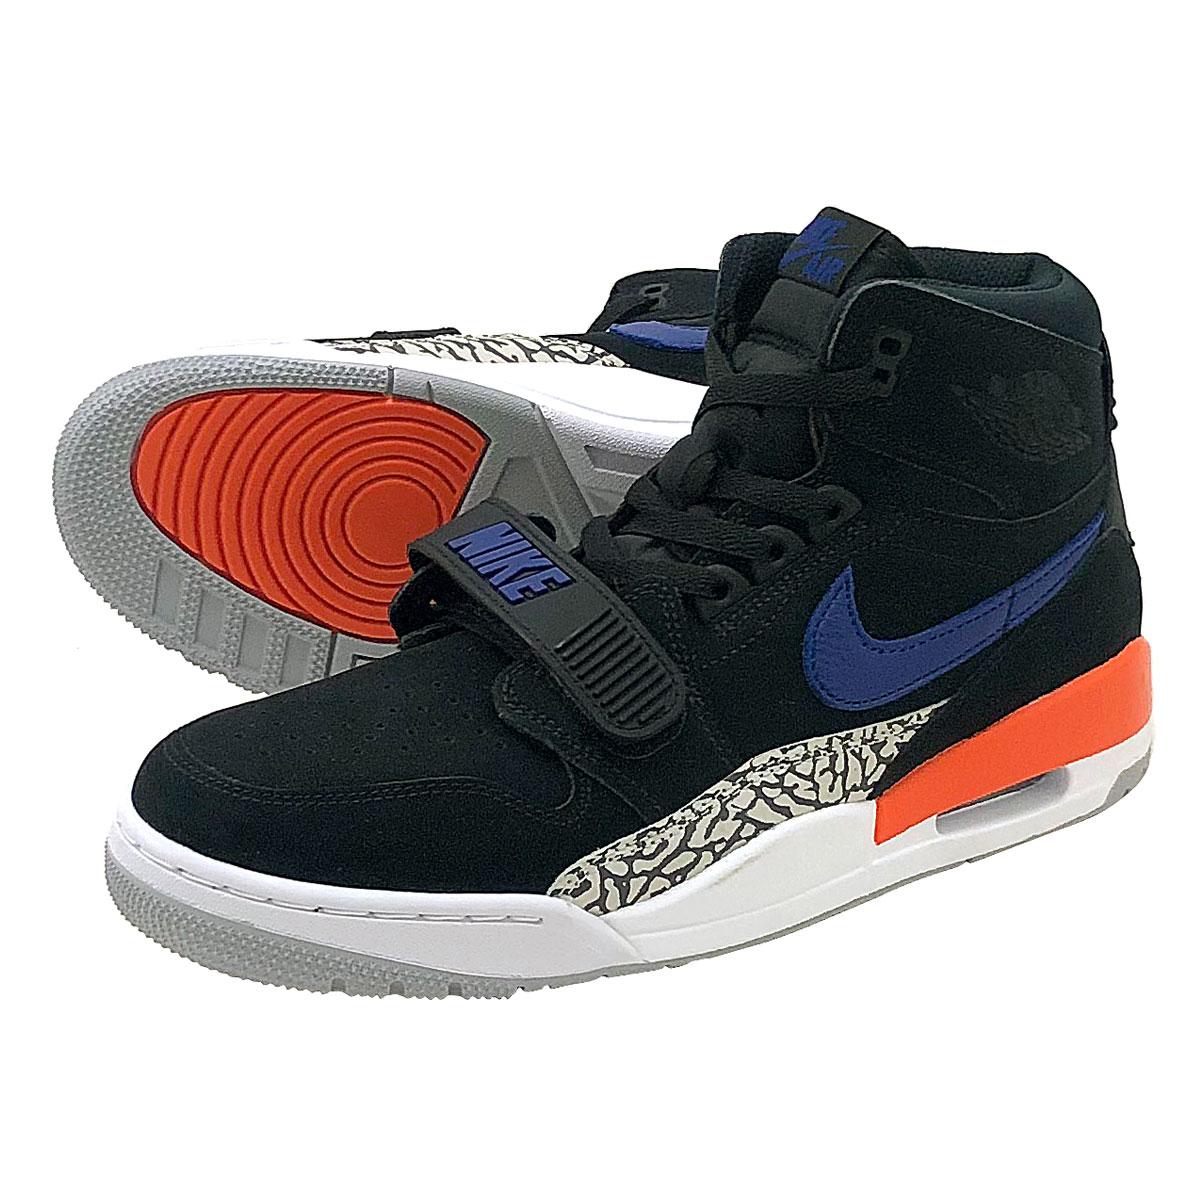 buy popular 72e79 7810e LOWTEX PLUS  NIKE AIR JORDAN LEGACY 312 Nike Air Jordan Legacy 312  BLACK RUSH BLUE ORANGE BRILLIANT av3922-048   Rakuten Global Market